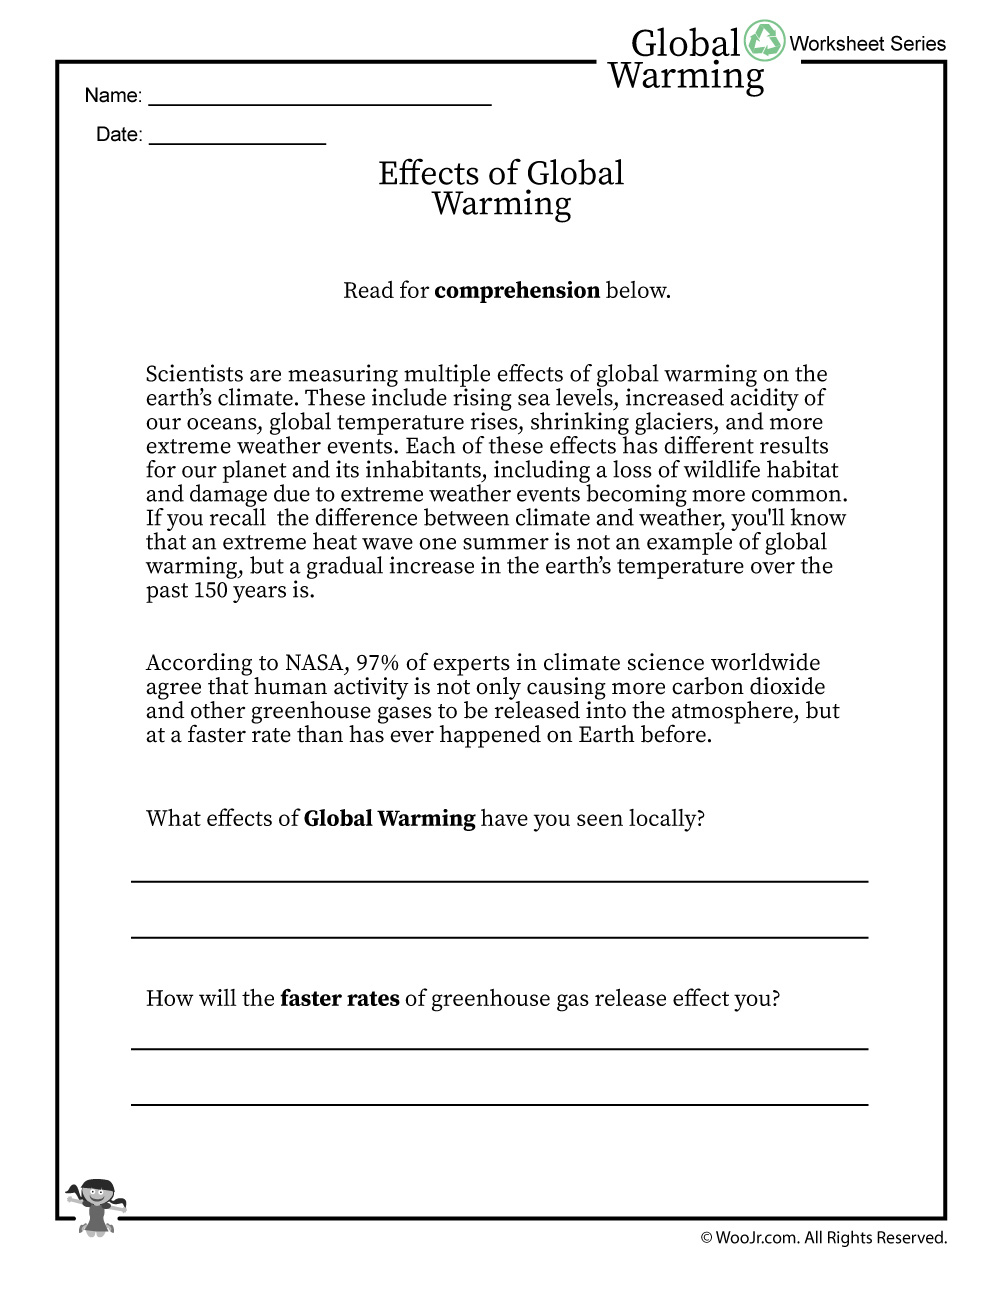 Global Warming Effects Printable Reading Worksheet | Woo! Jr. Kids | Climate Change Printable Worksheets